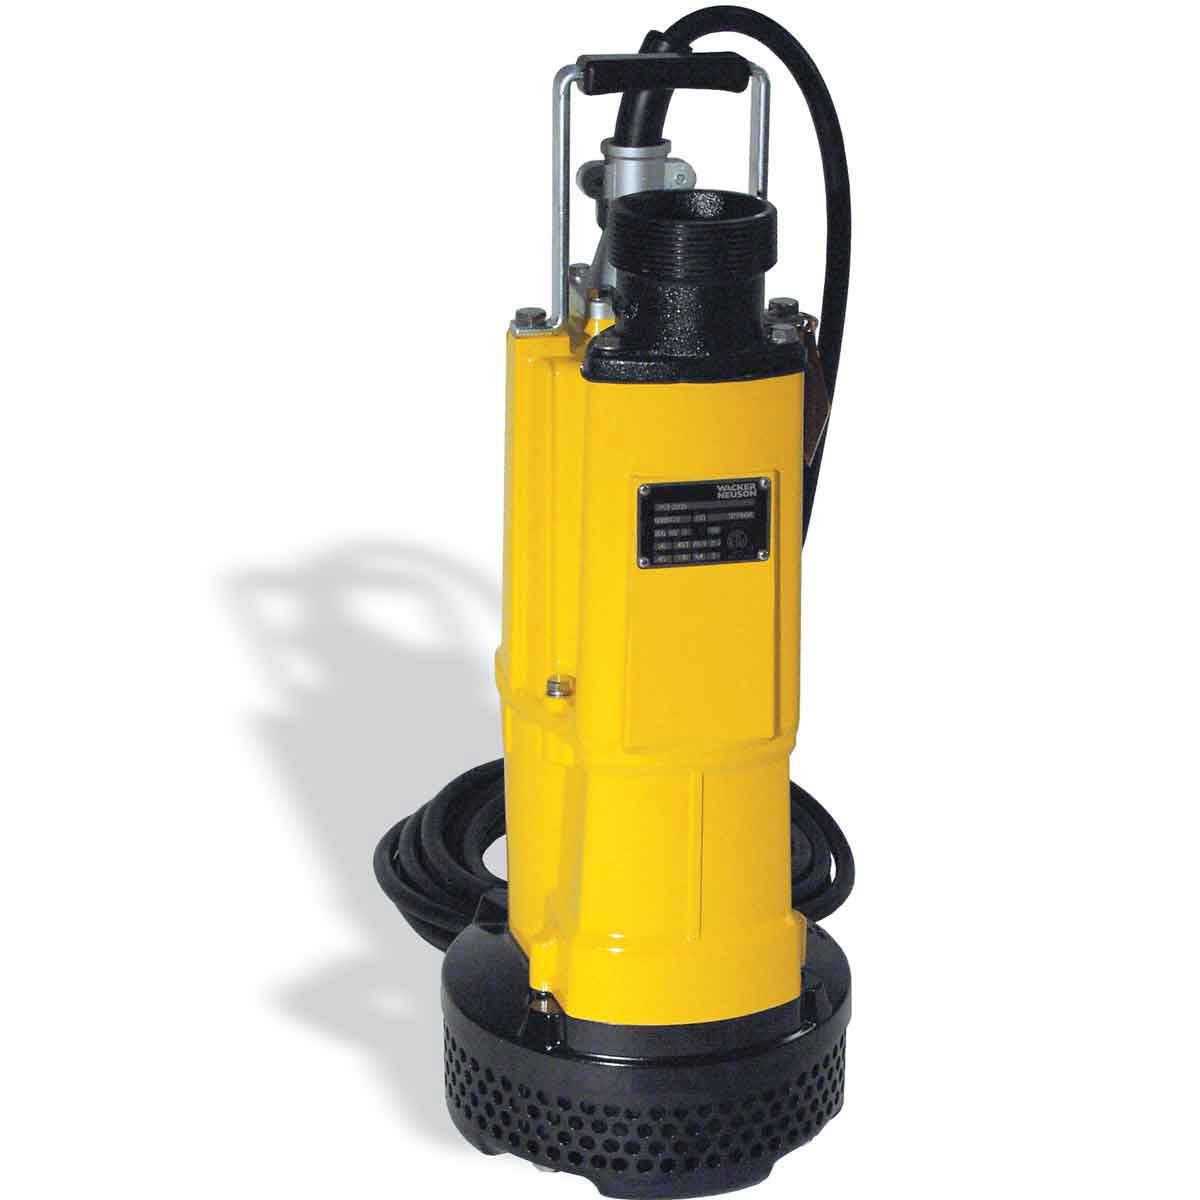 Wacker Neuson 3 inch Submersible Pump 220V 3 Phase PS3